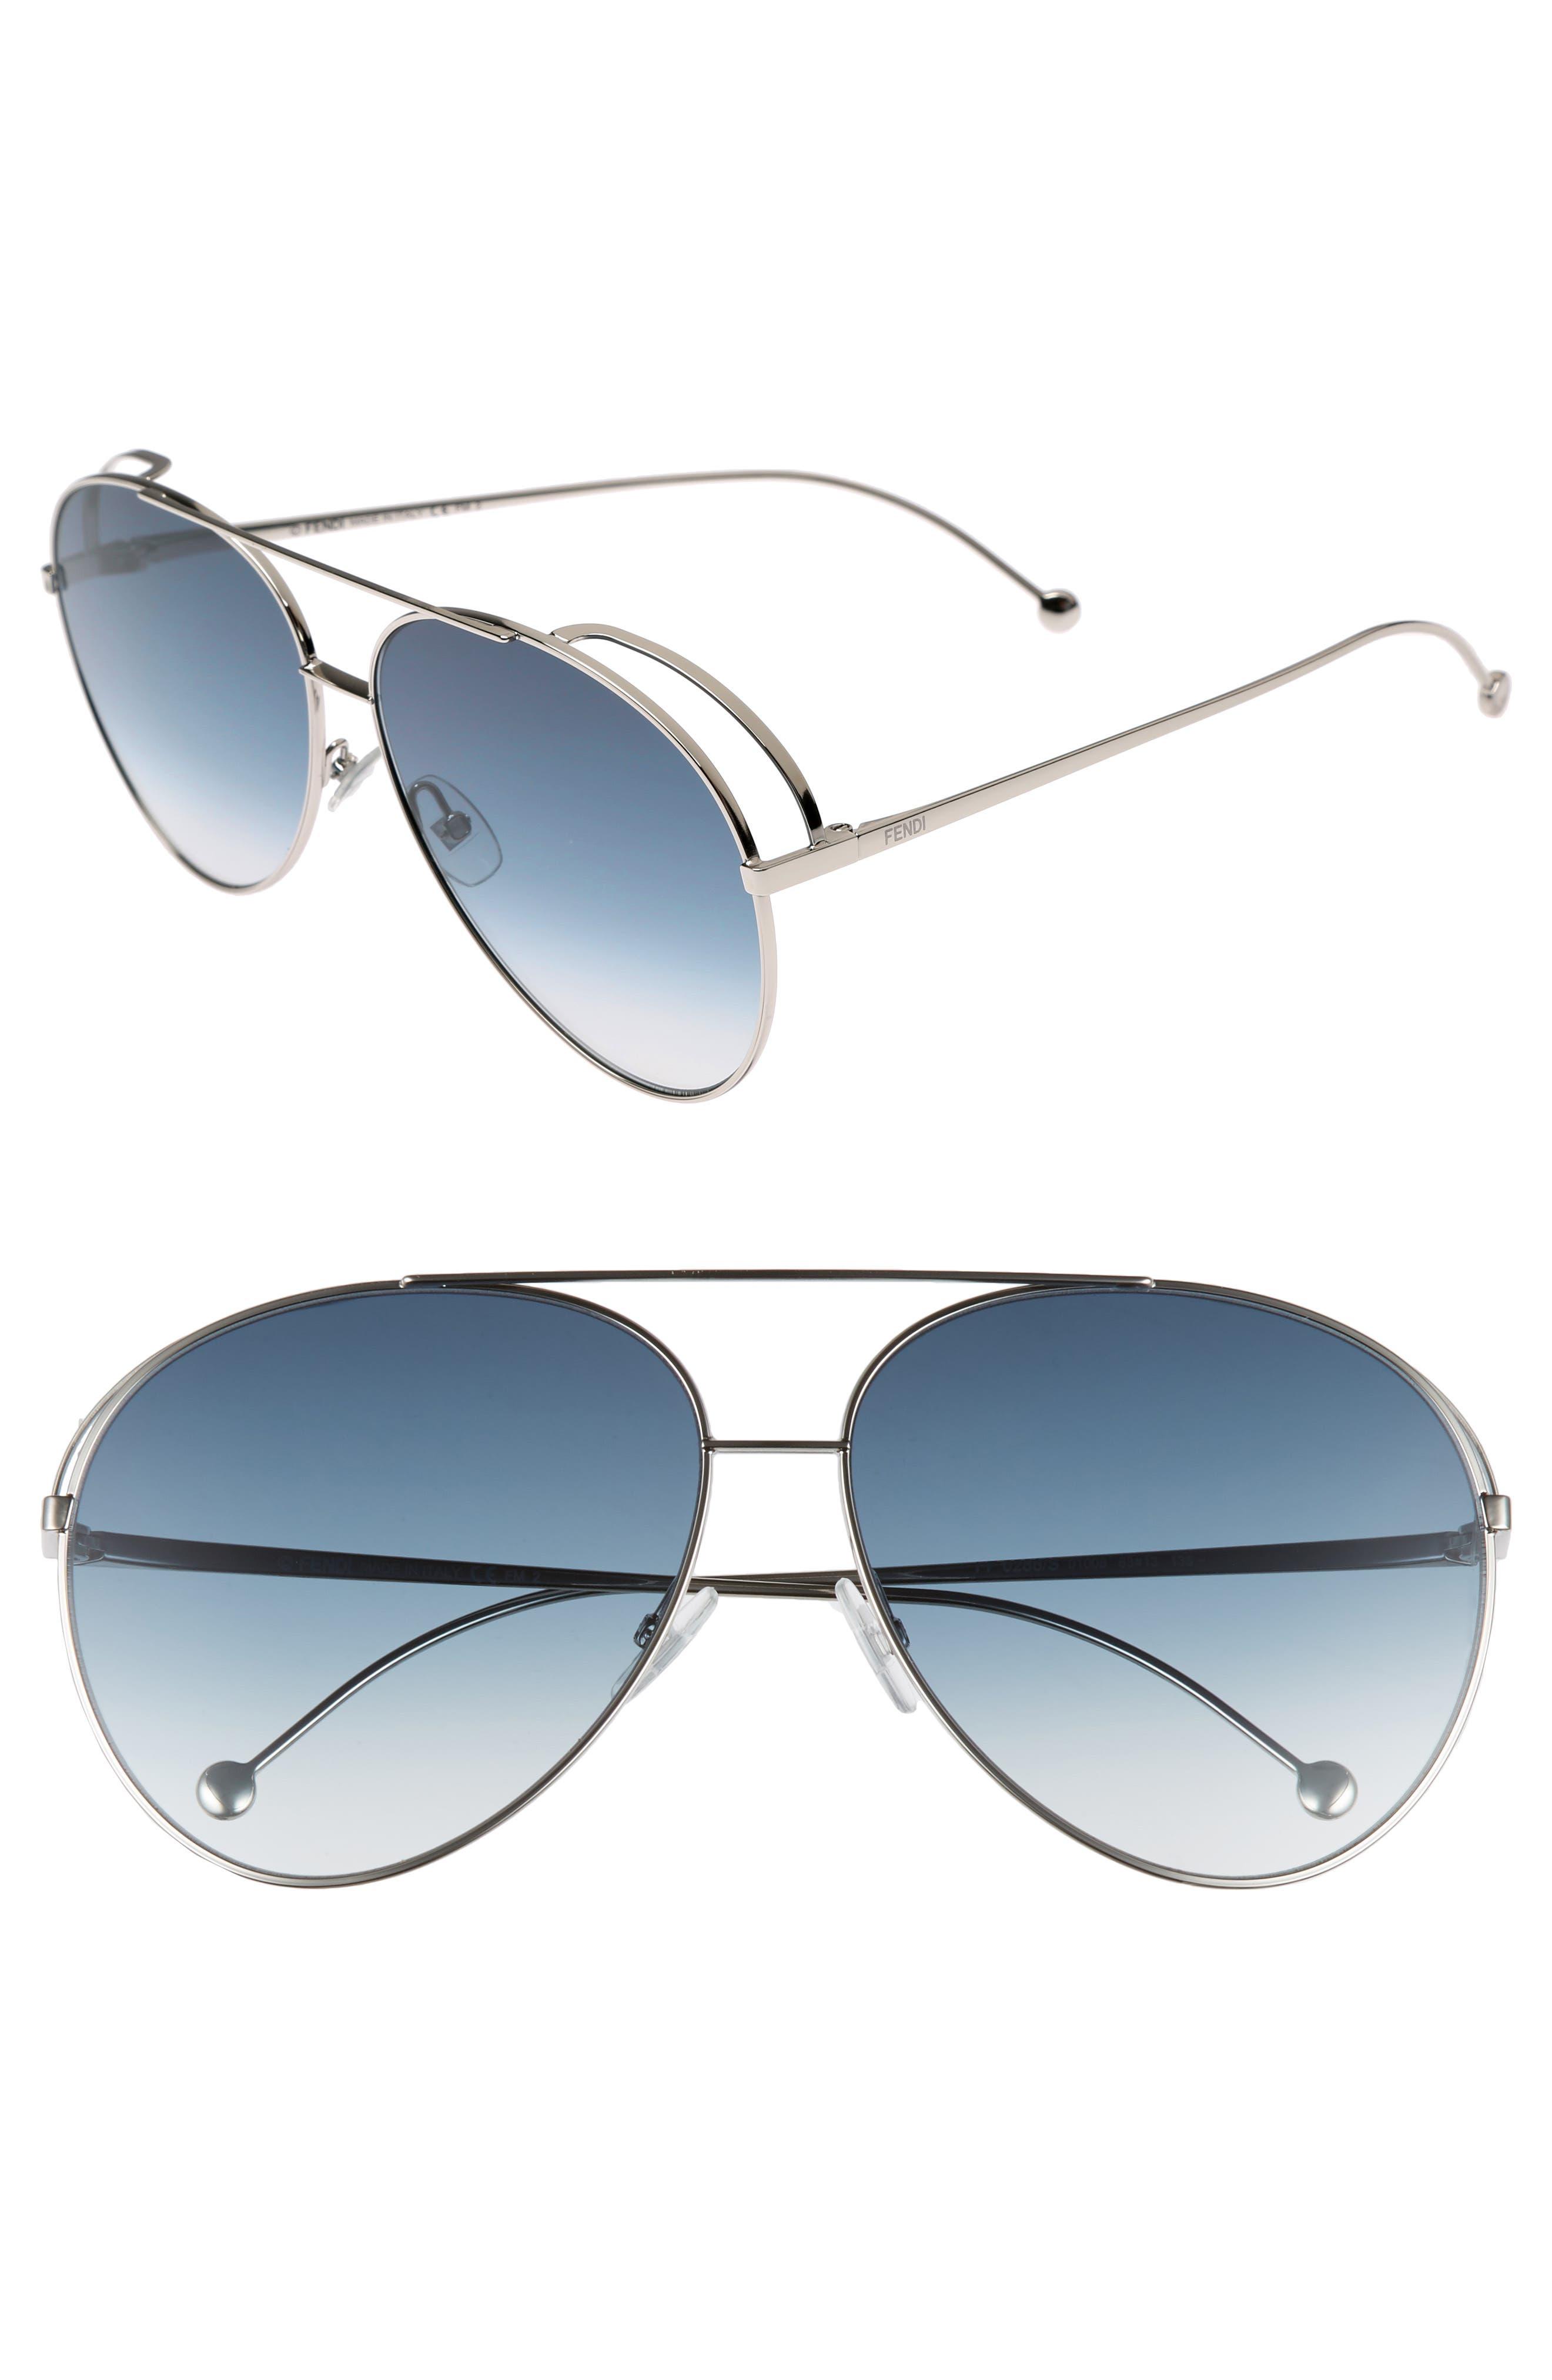 Alternate Image 1 Selected - Fendi 52mm Aviator Sunglasses